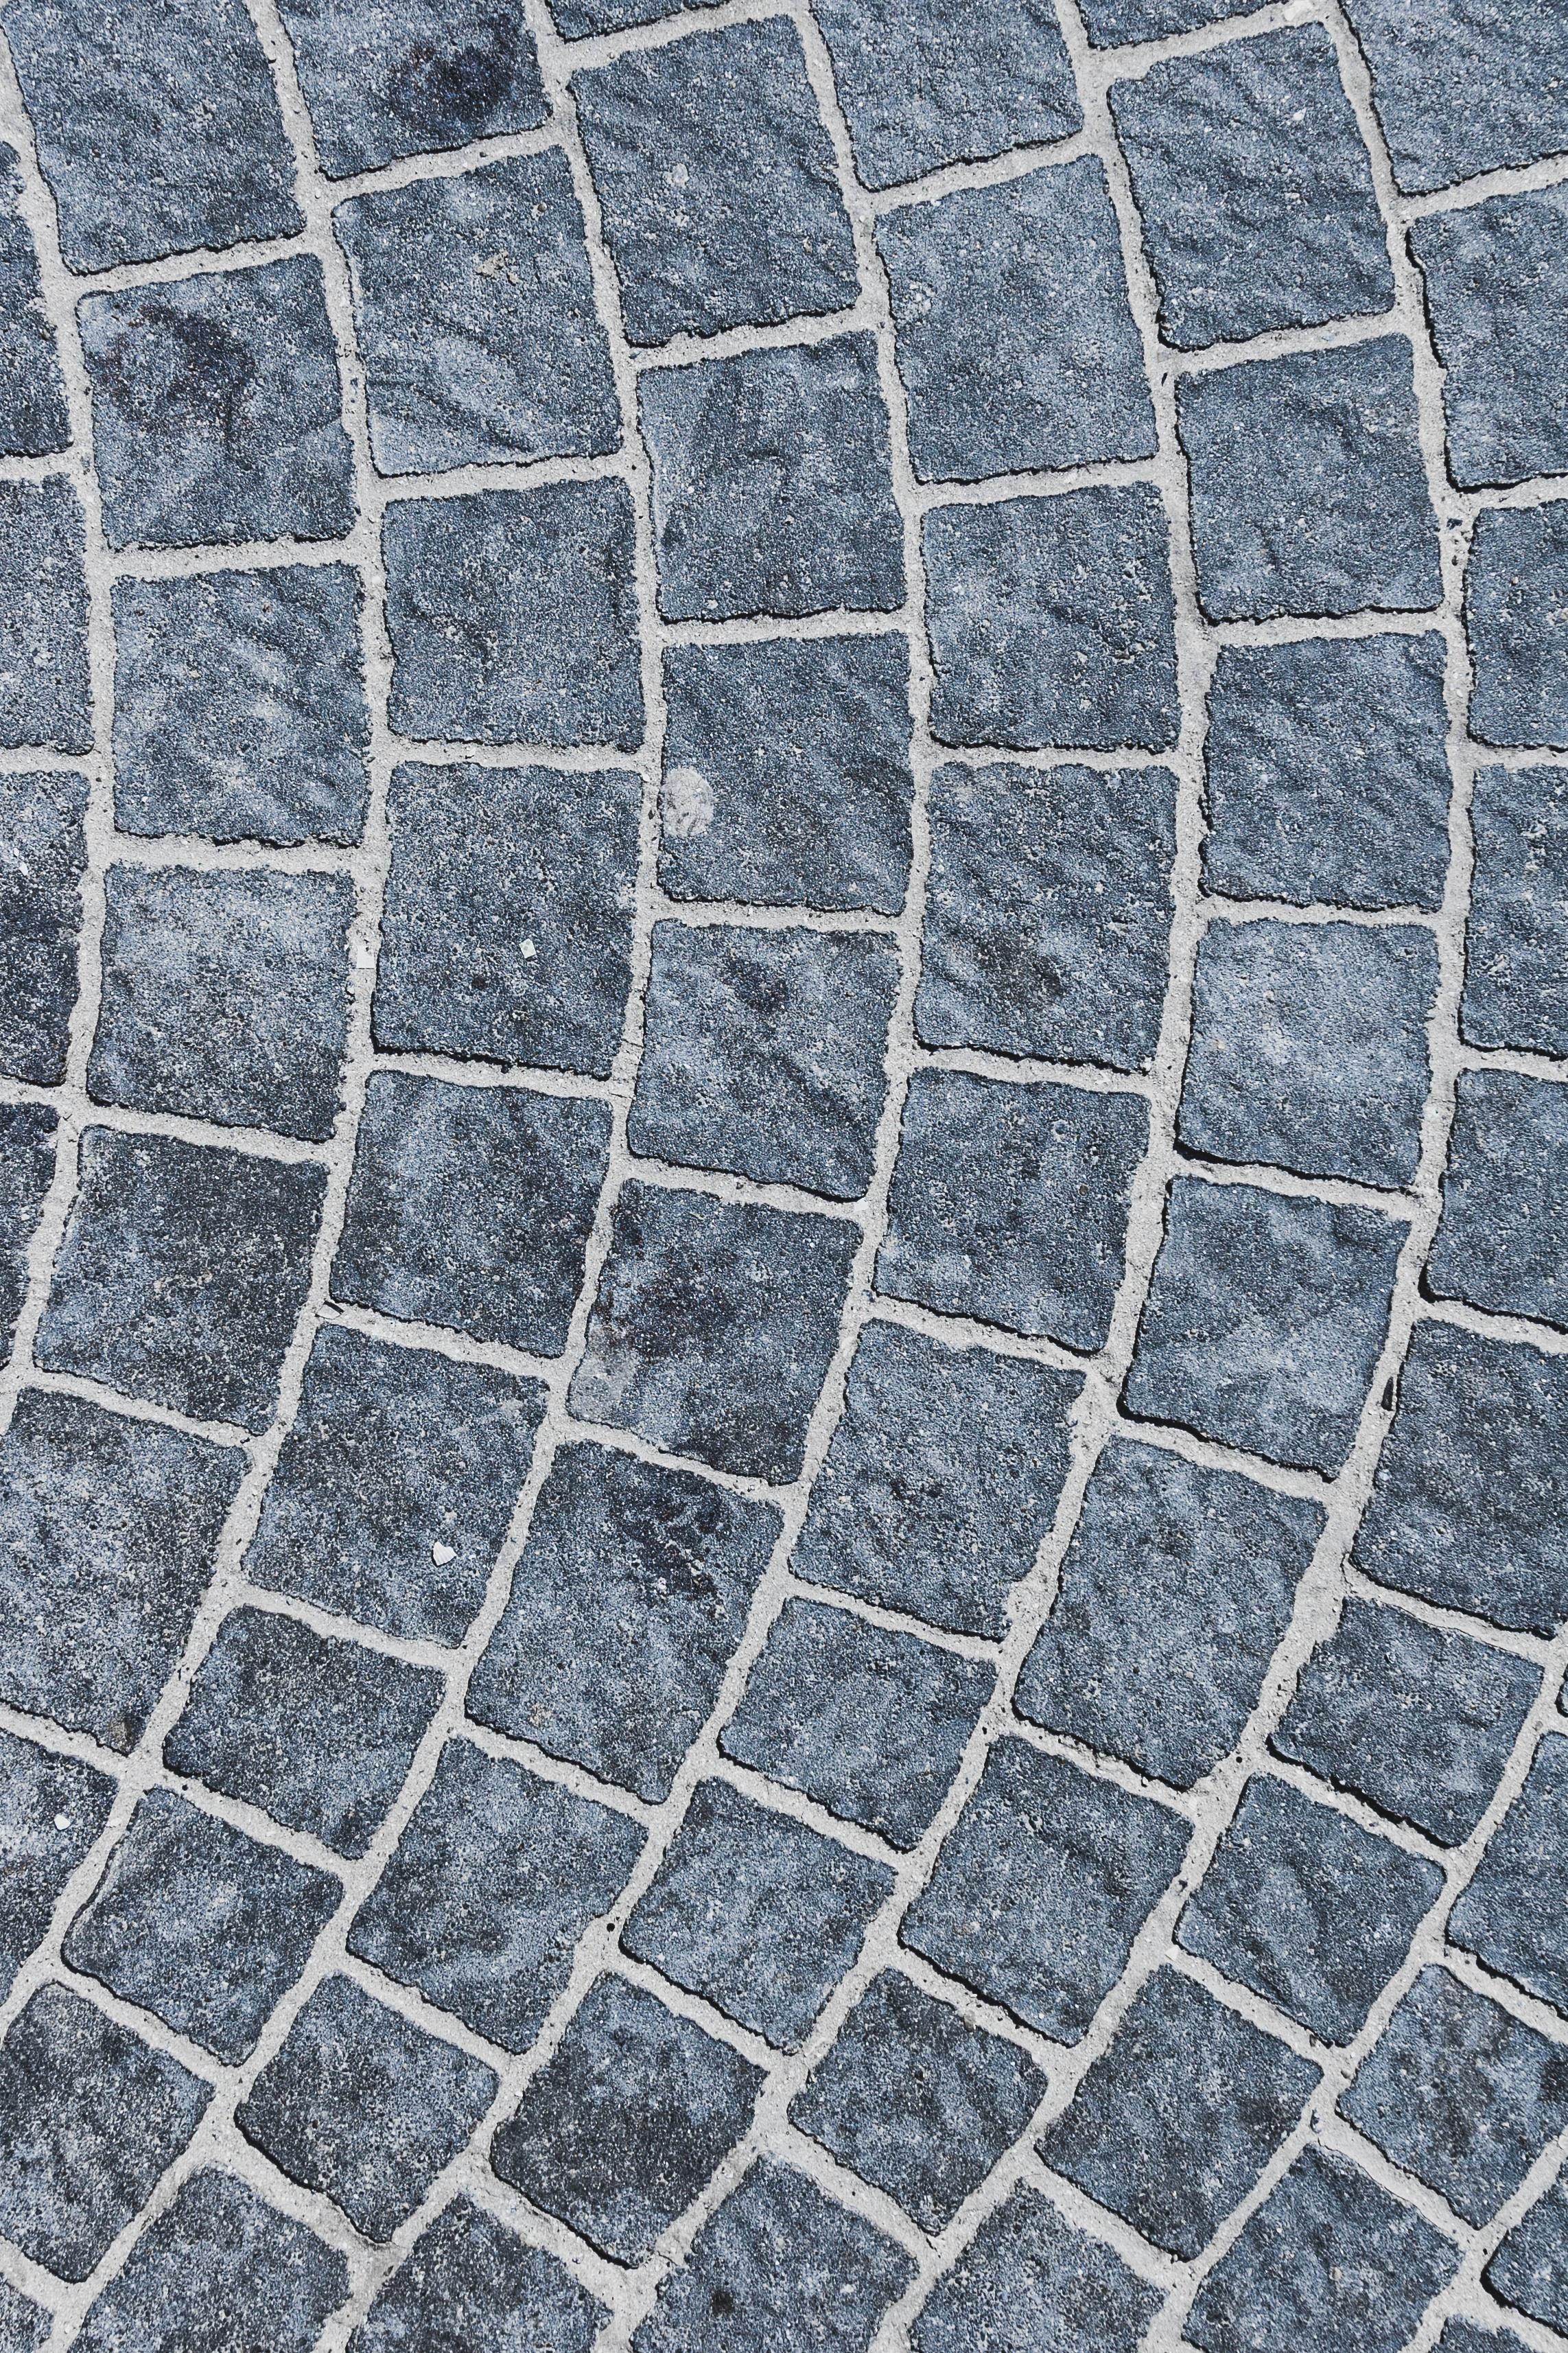 Free Images : sidewalk, floor, cobblestone, wall, asphalt, pattern ...